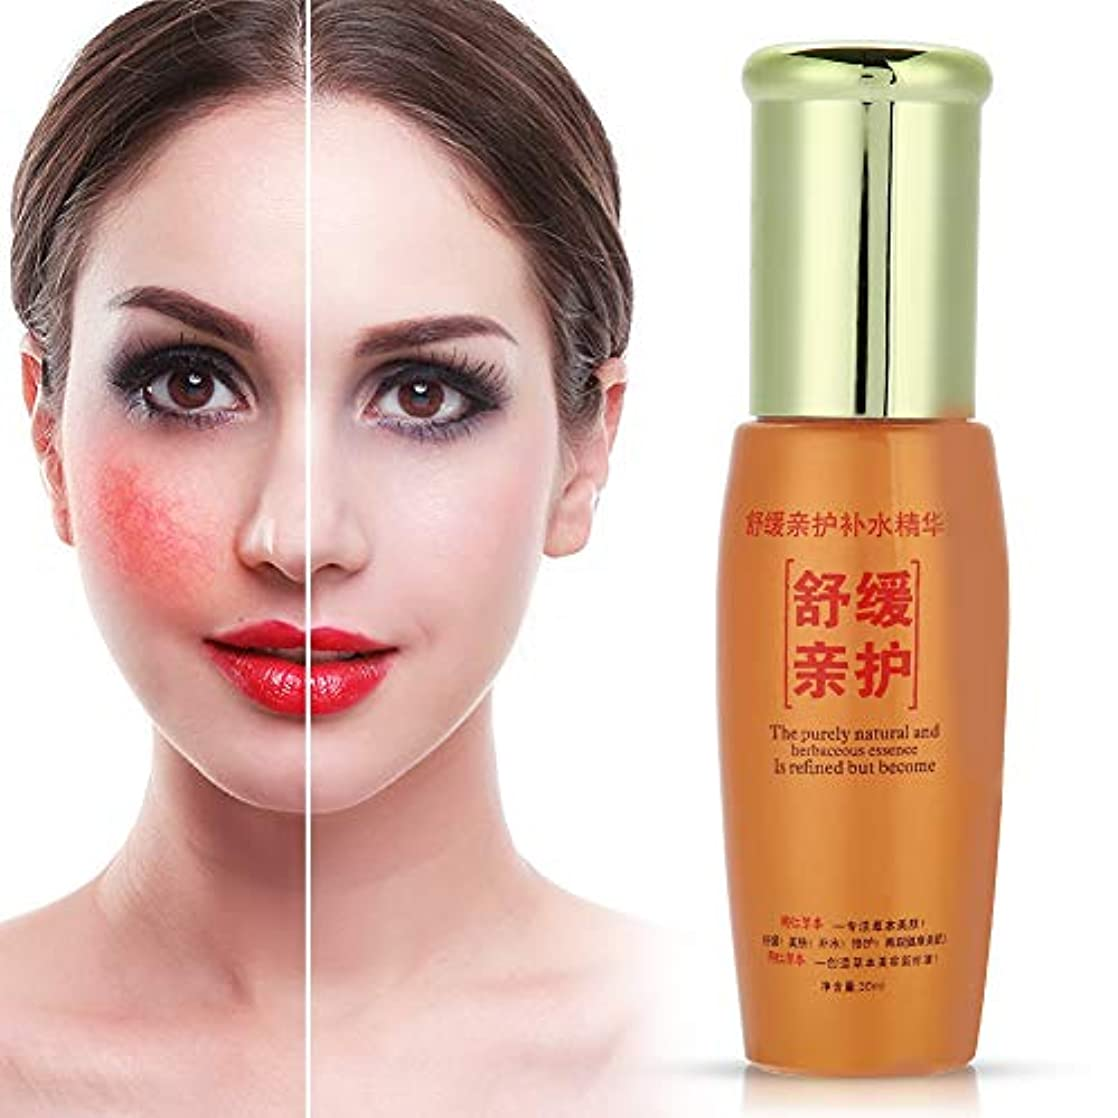 100mlスキンケアエッセンシャルオイル、スプレー式 角質除去 補水保湿 縮小毛穴 肌の明るさと肌への潤い フェイススキンケア製品